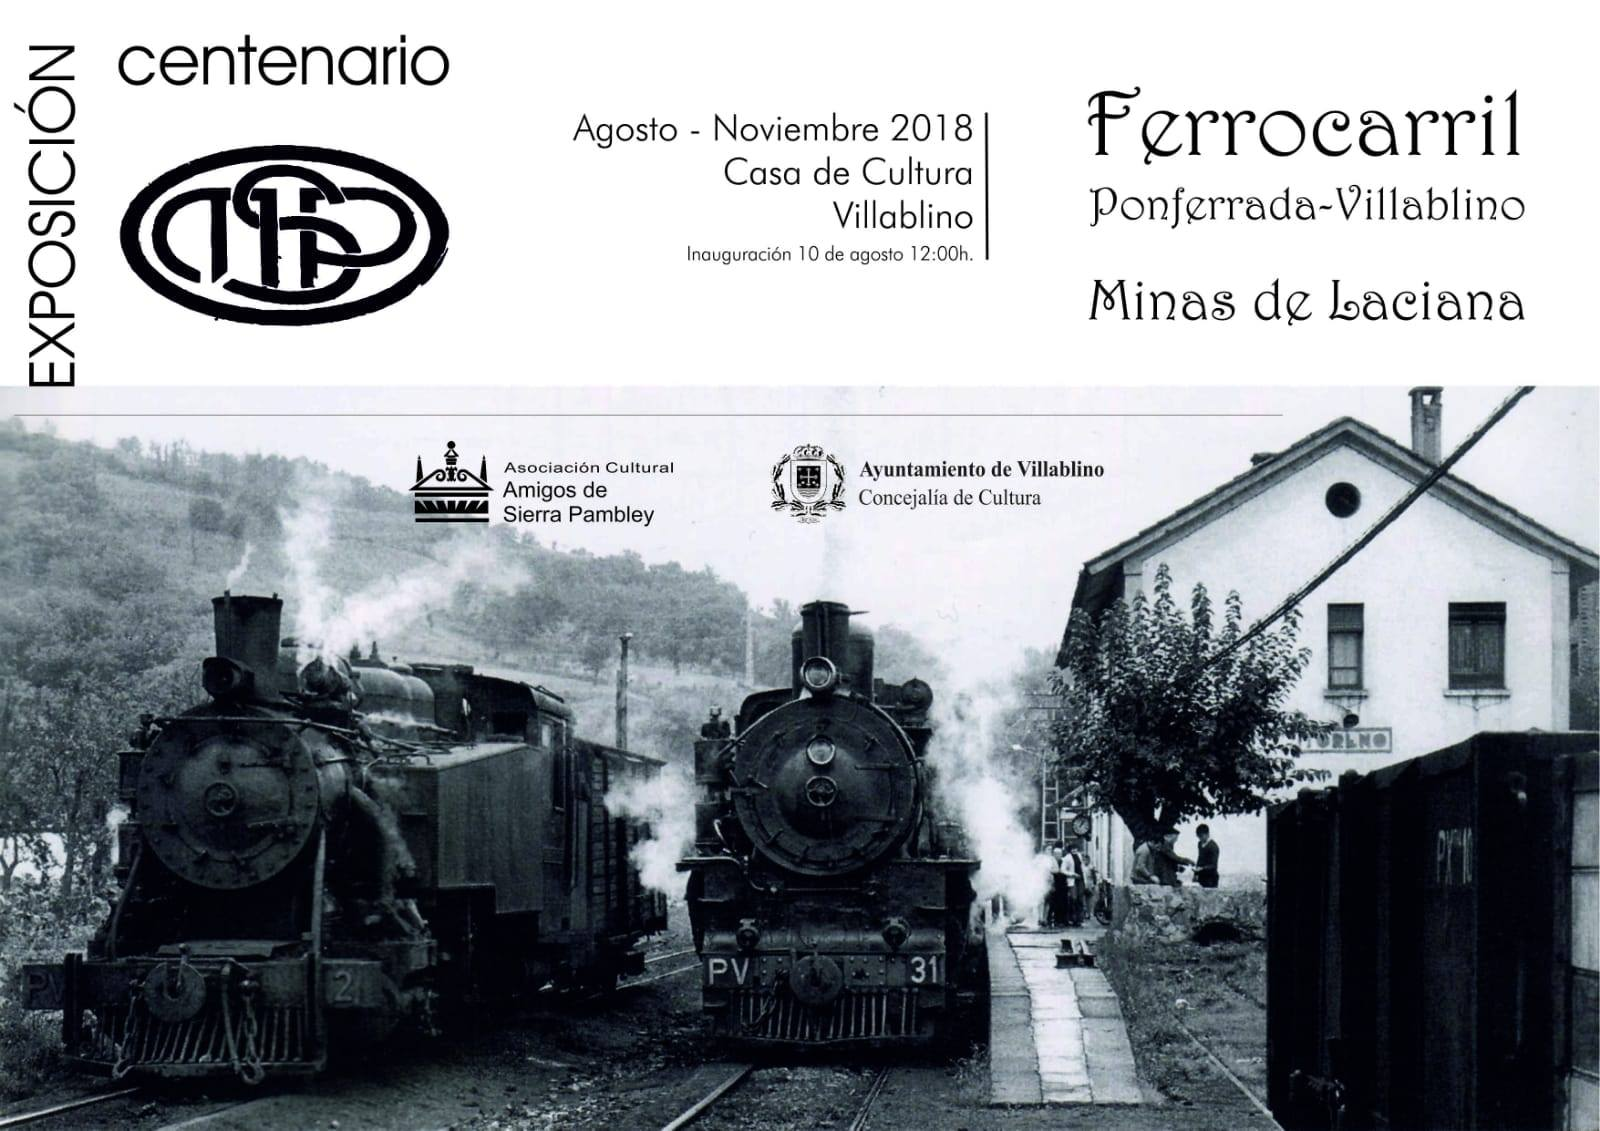 El Ferrocarril de Ponferrada a Villablino: El Ponferrada